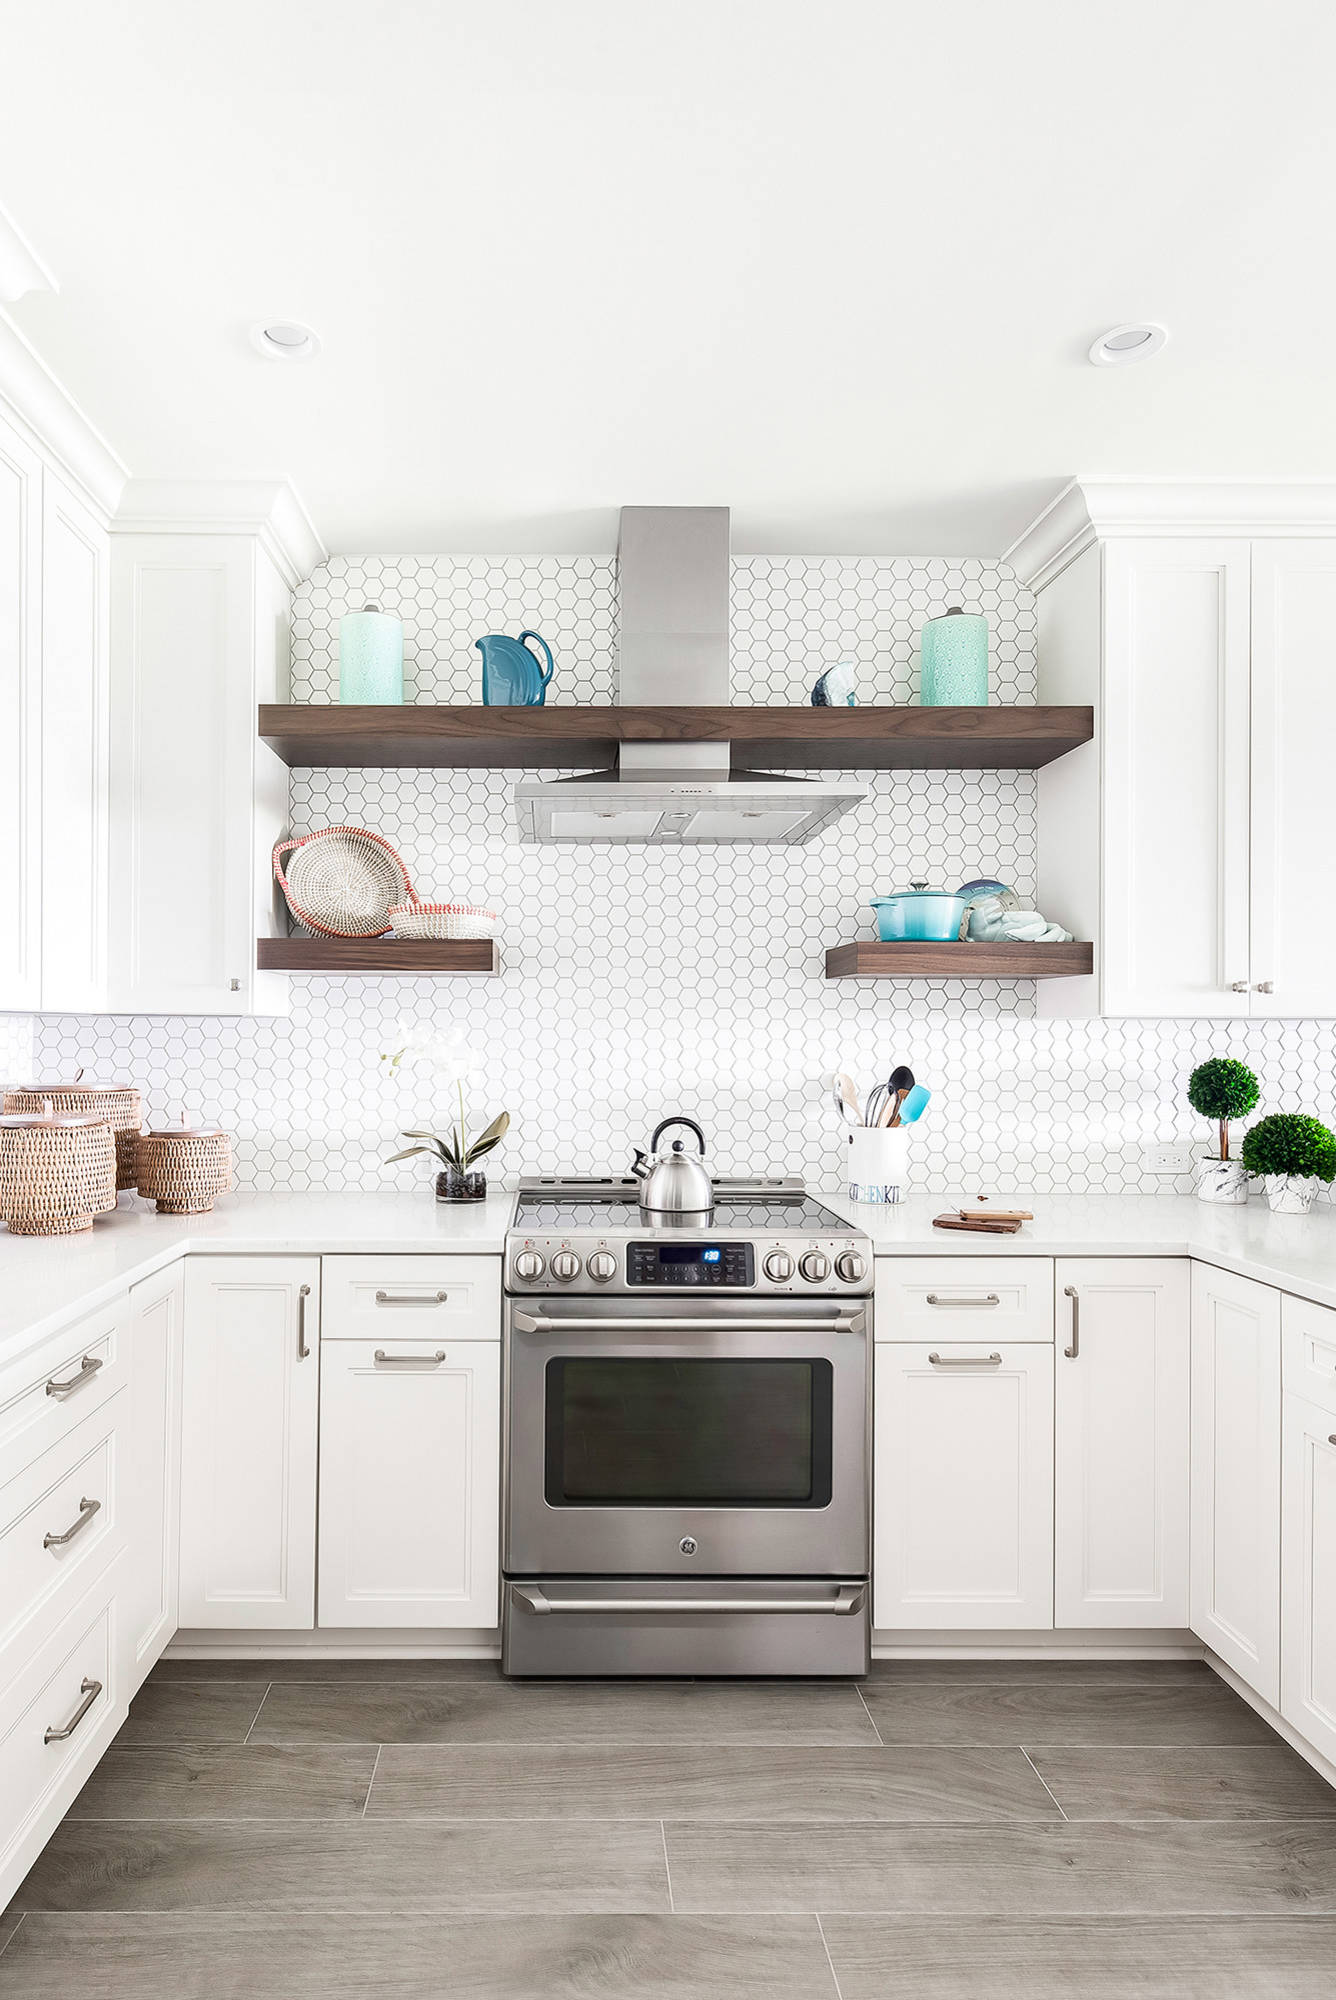 Beach Condo Kitchen Ideas Photos Houzz